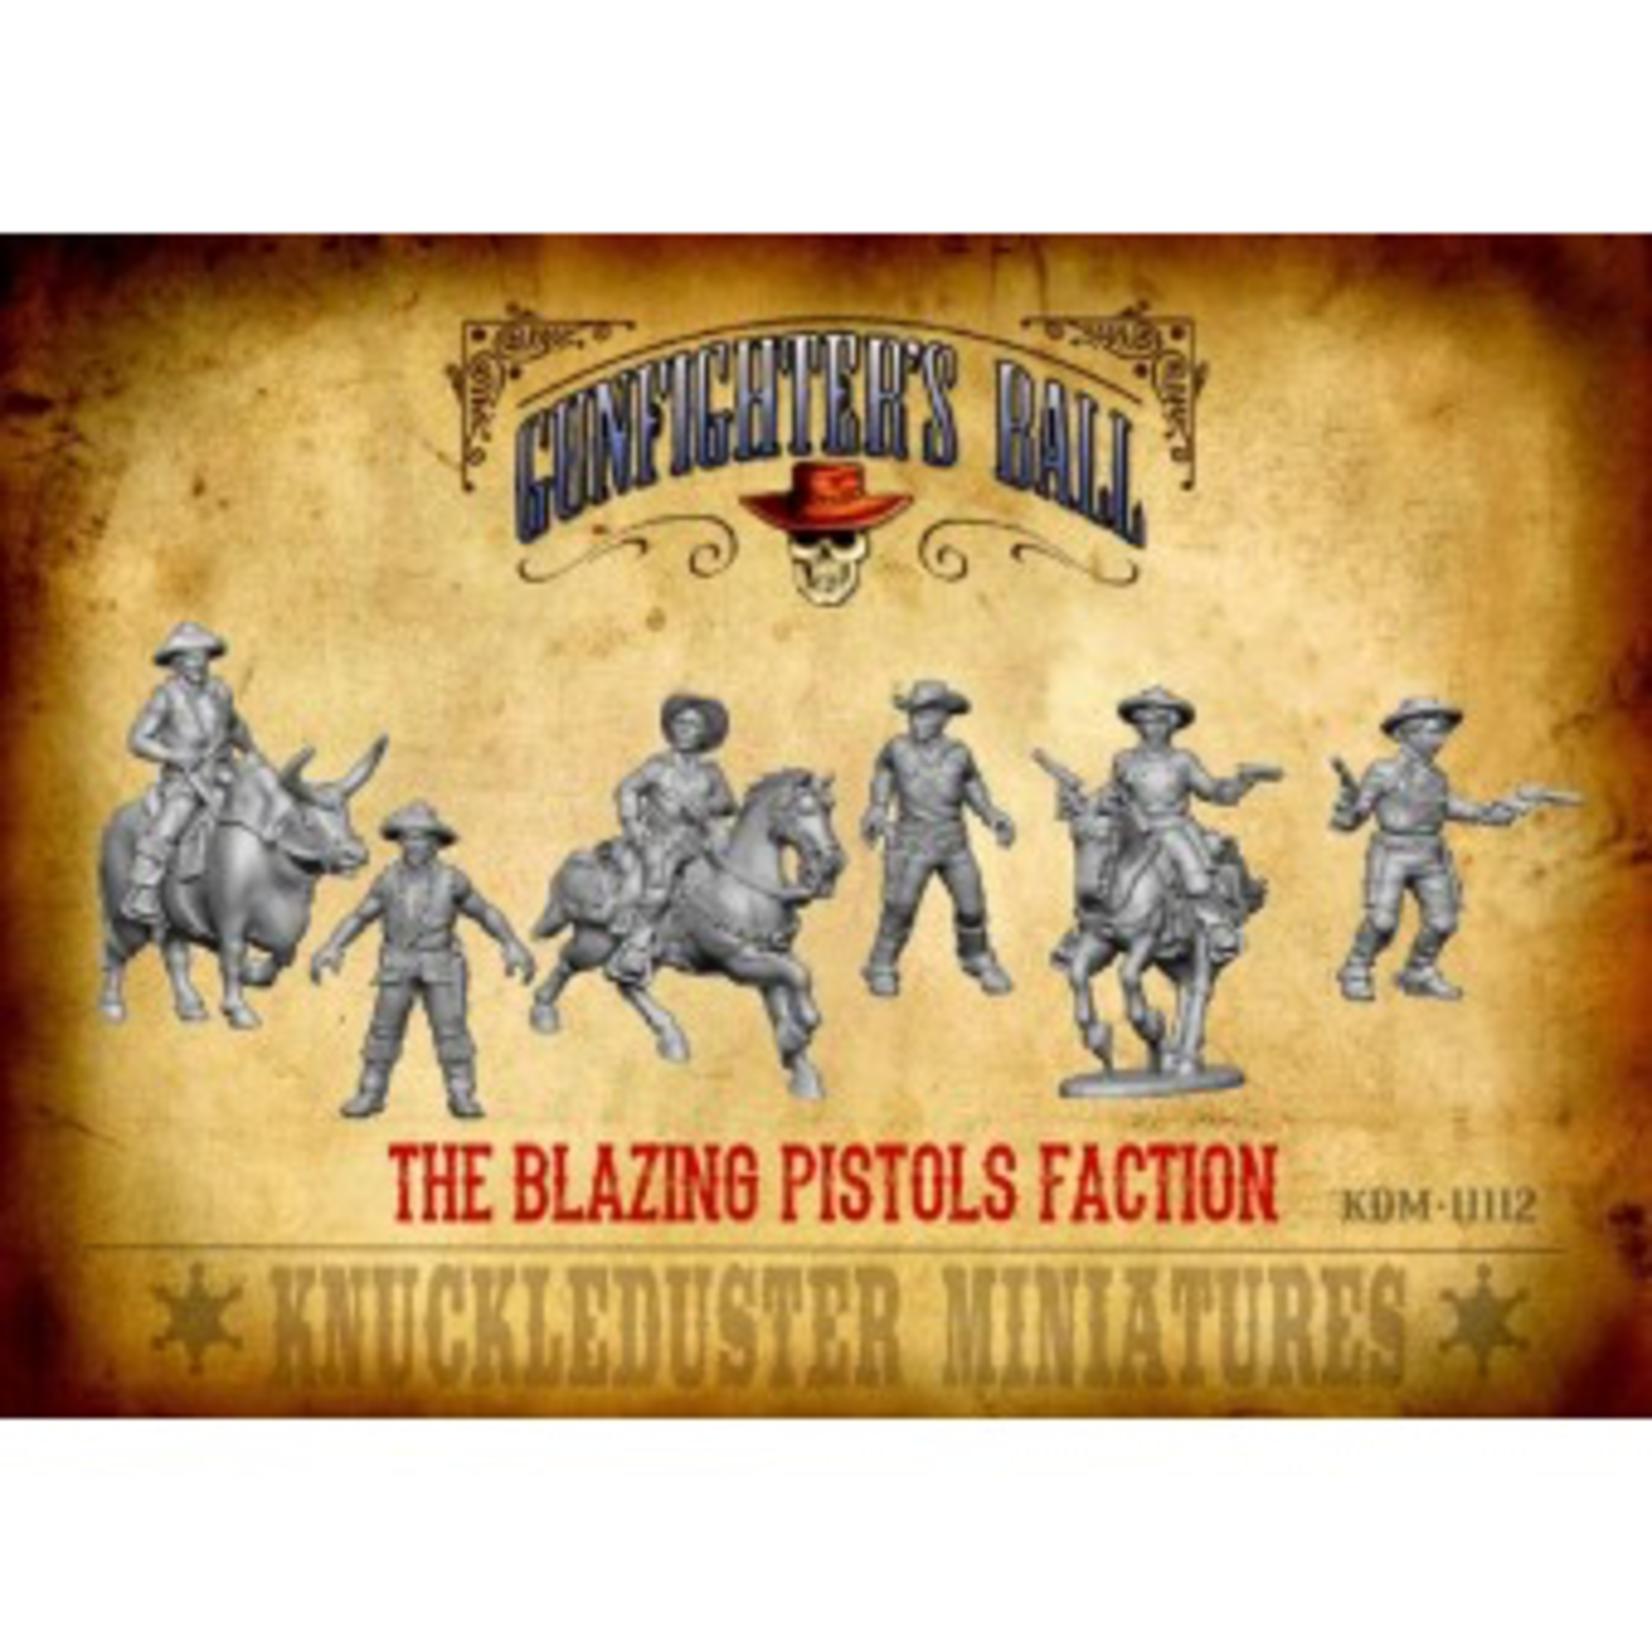 Blazing Pistols Faction